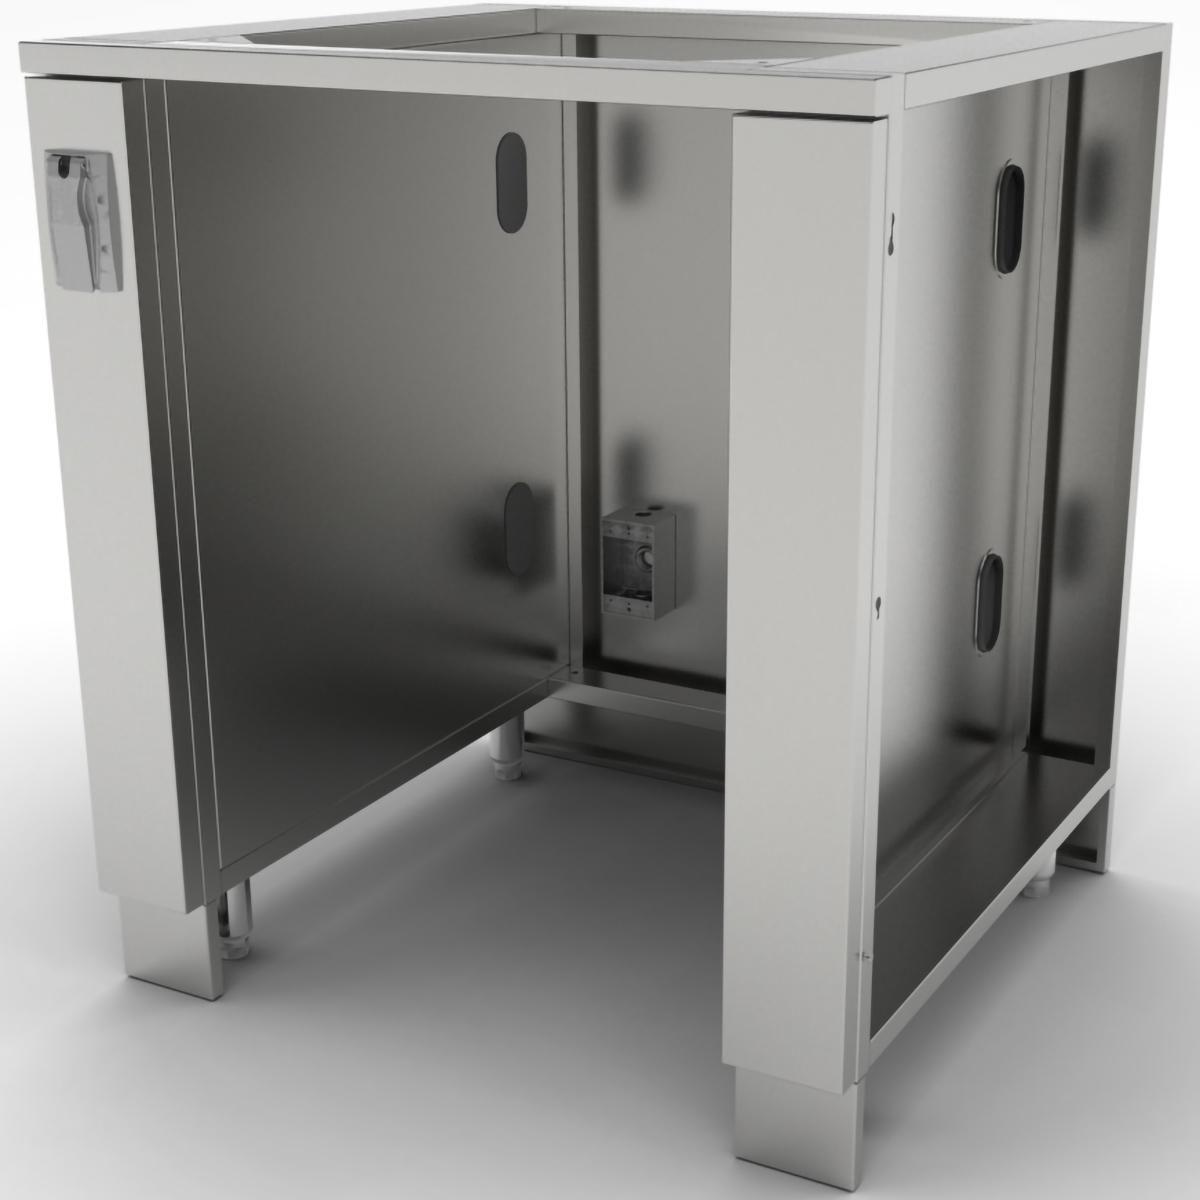 Sunstone 30 Outdoor Kitchen Refrigerator Appliance Cabinet Sac30apc Outdoor Fridge Cabinet Appliance Cabinet Outdoor Kitchen